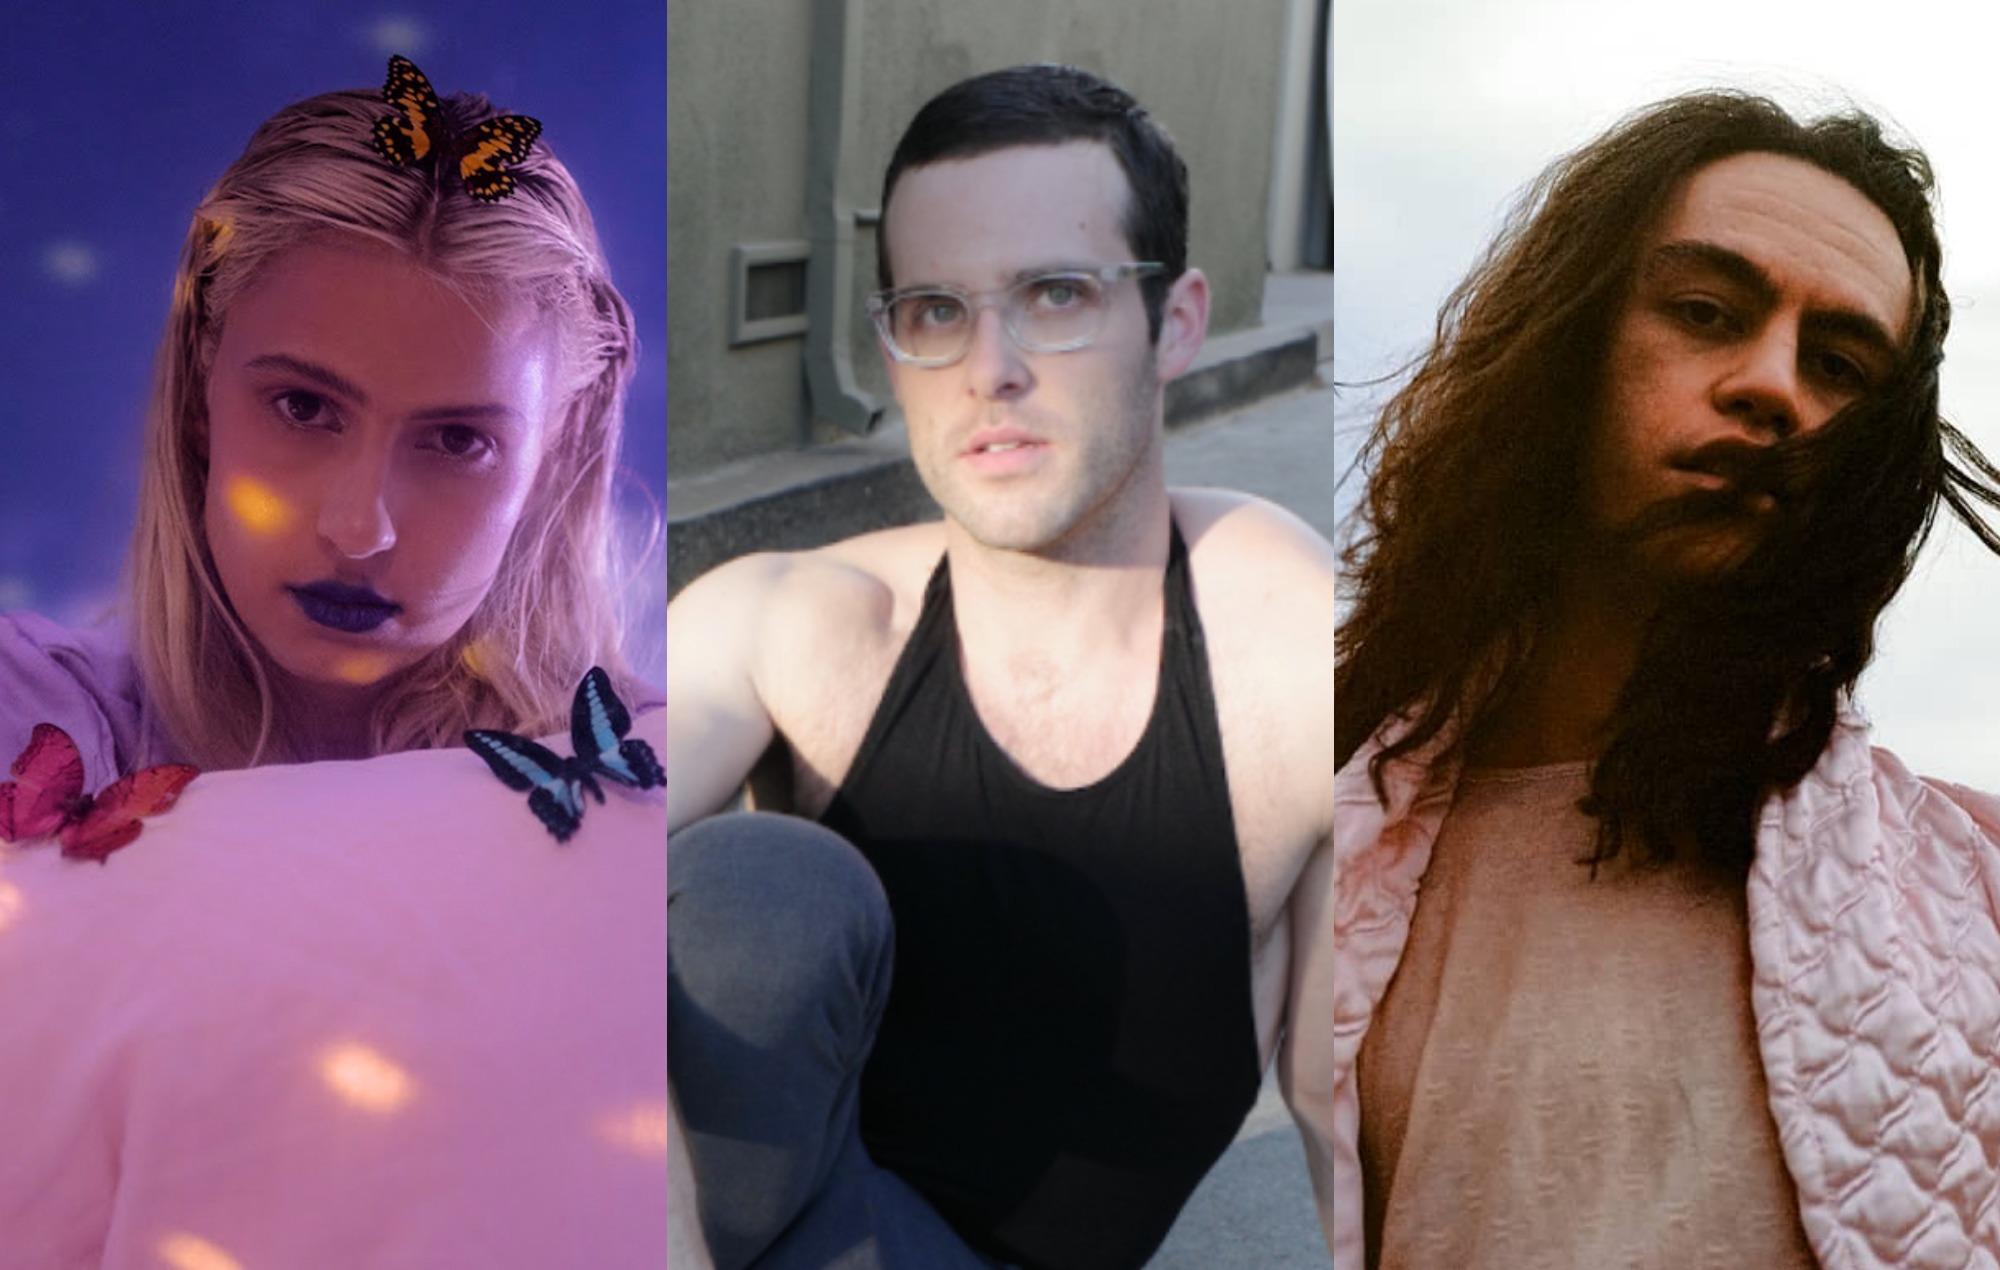 Banoffee, Baths, Lonelyspeck lead Isol-Aid #14 this weekend | NME Australia